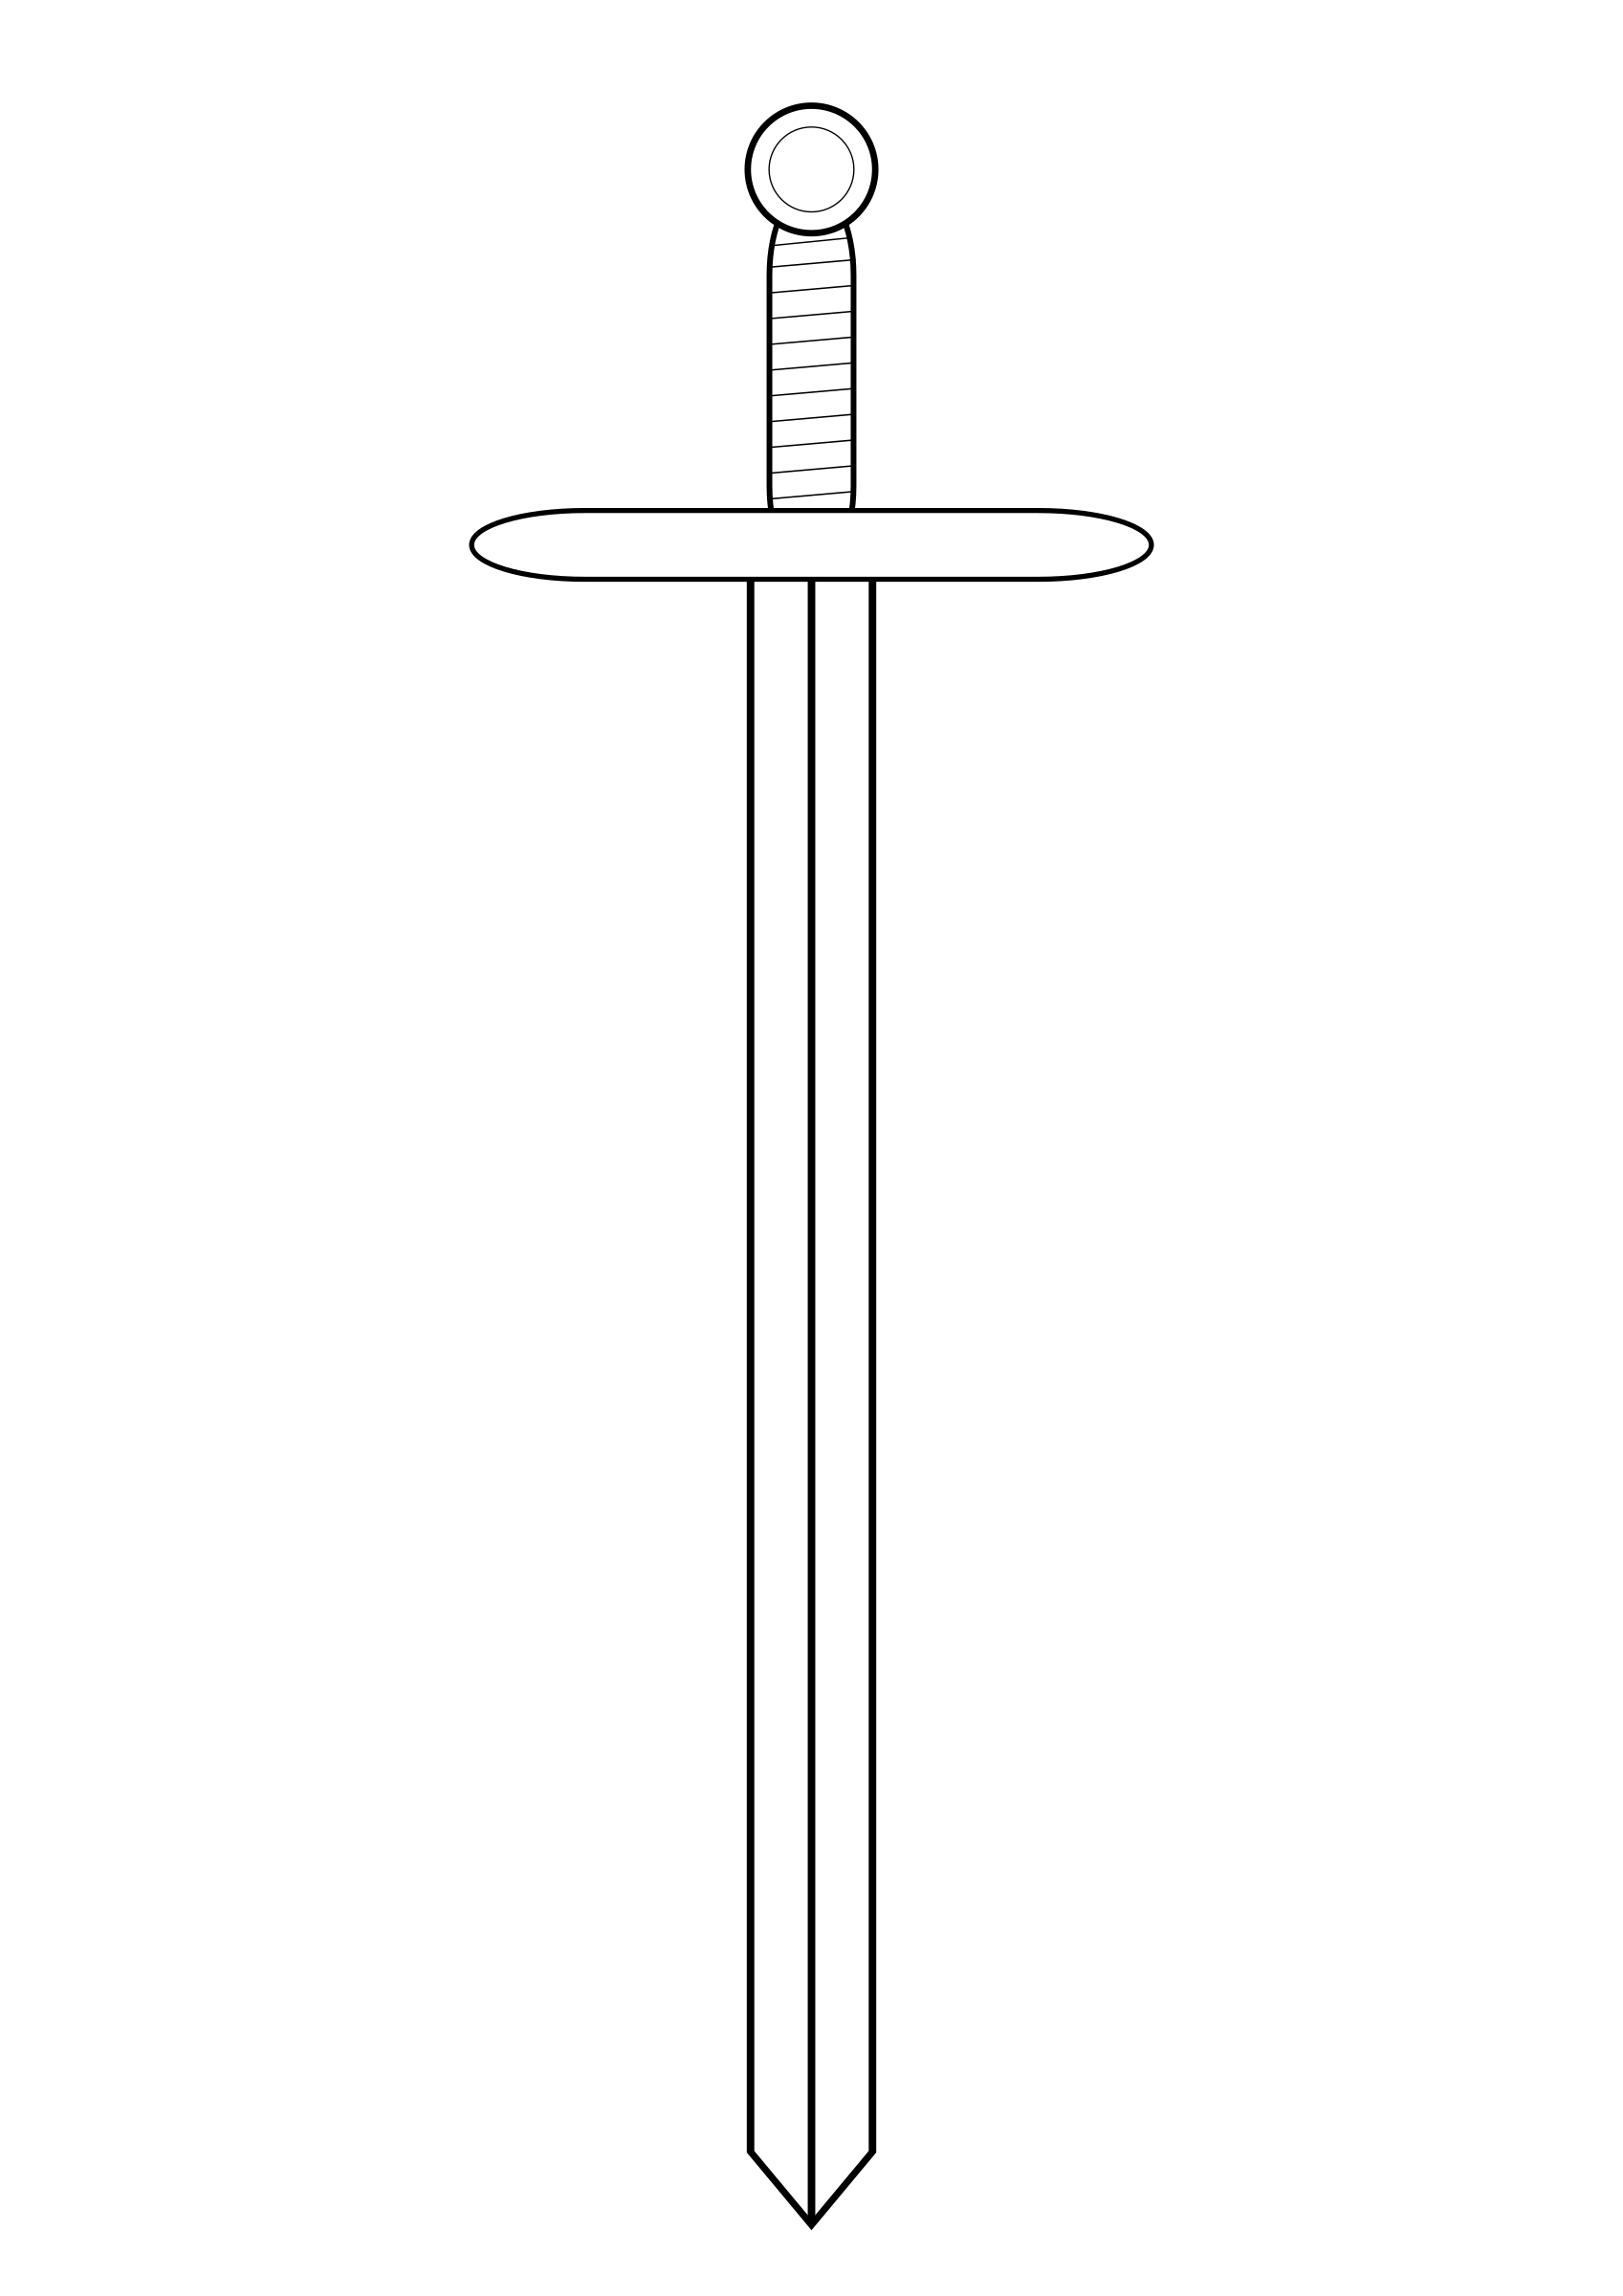 Clipart design sword. Line art big image